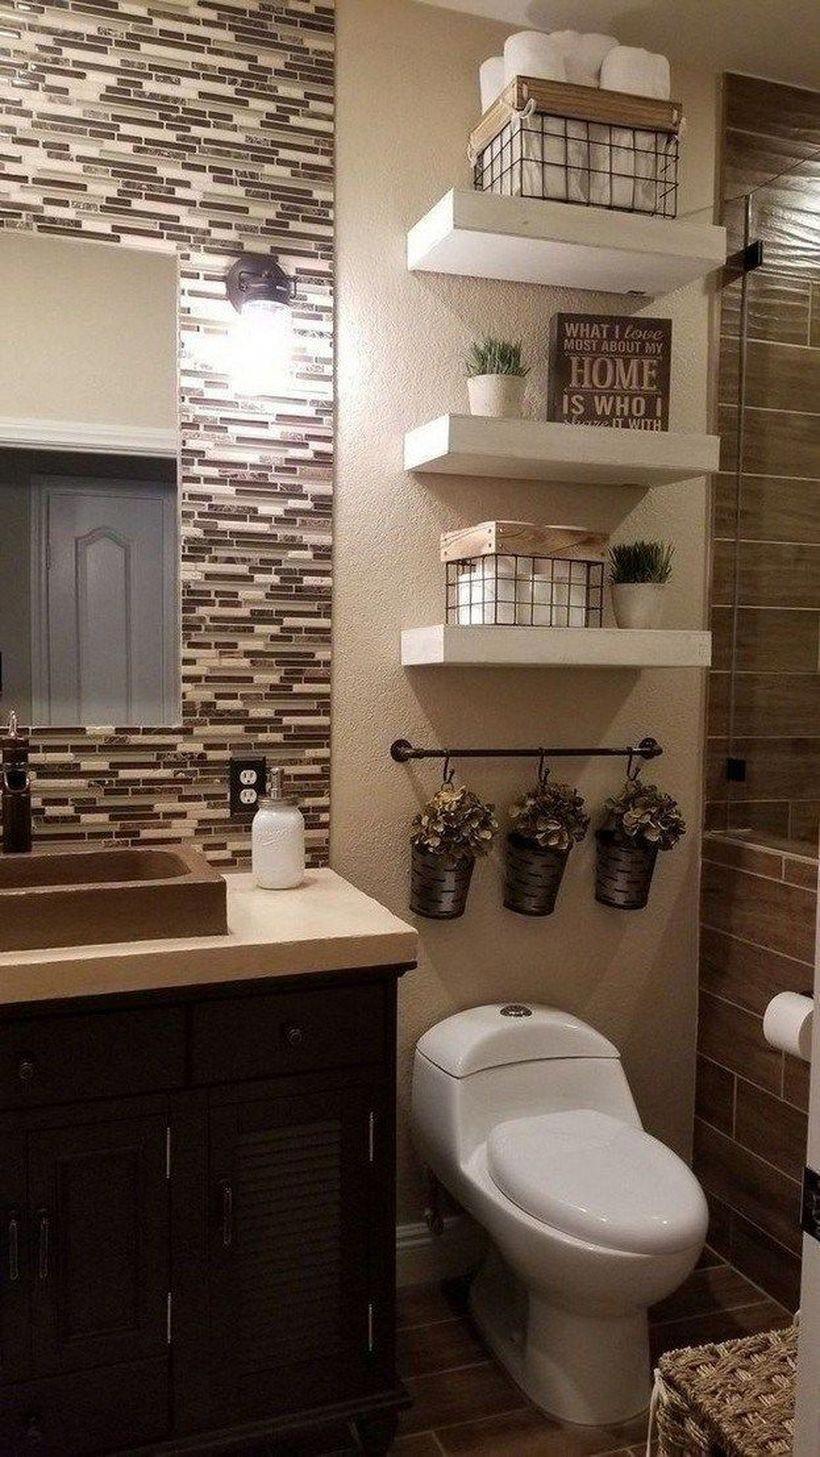 Bathroom Design Bathroom Design Tool Bathroom Ideas Bathroom Ideas Decor Bathroom Things In 2020 Small Bathroom Remodel Guest Bathroom Decor Small Bathroom Decor